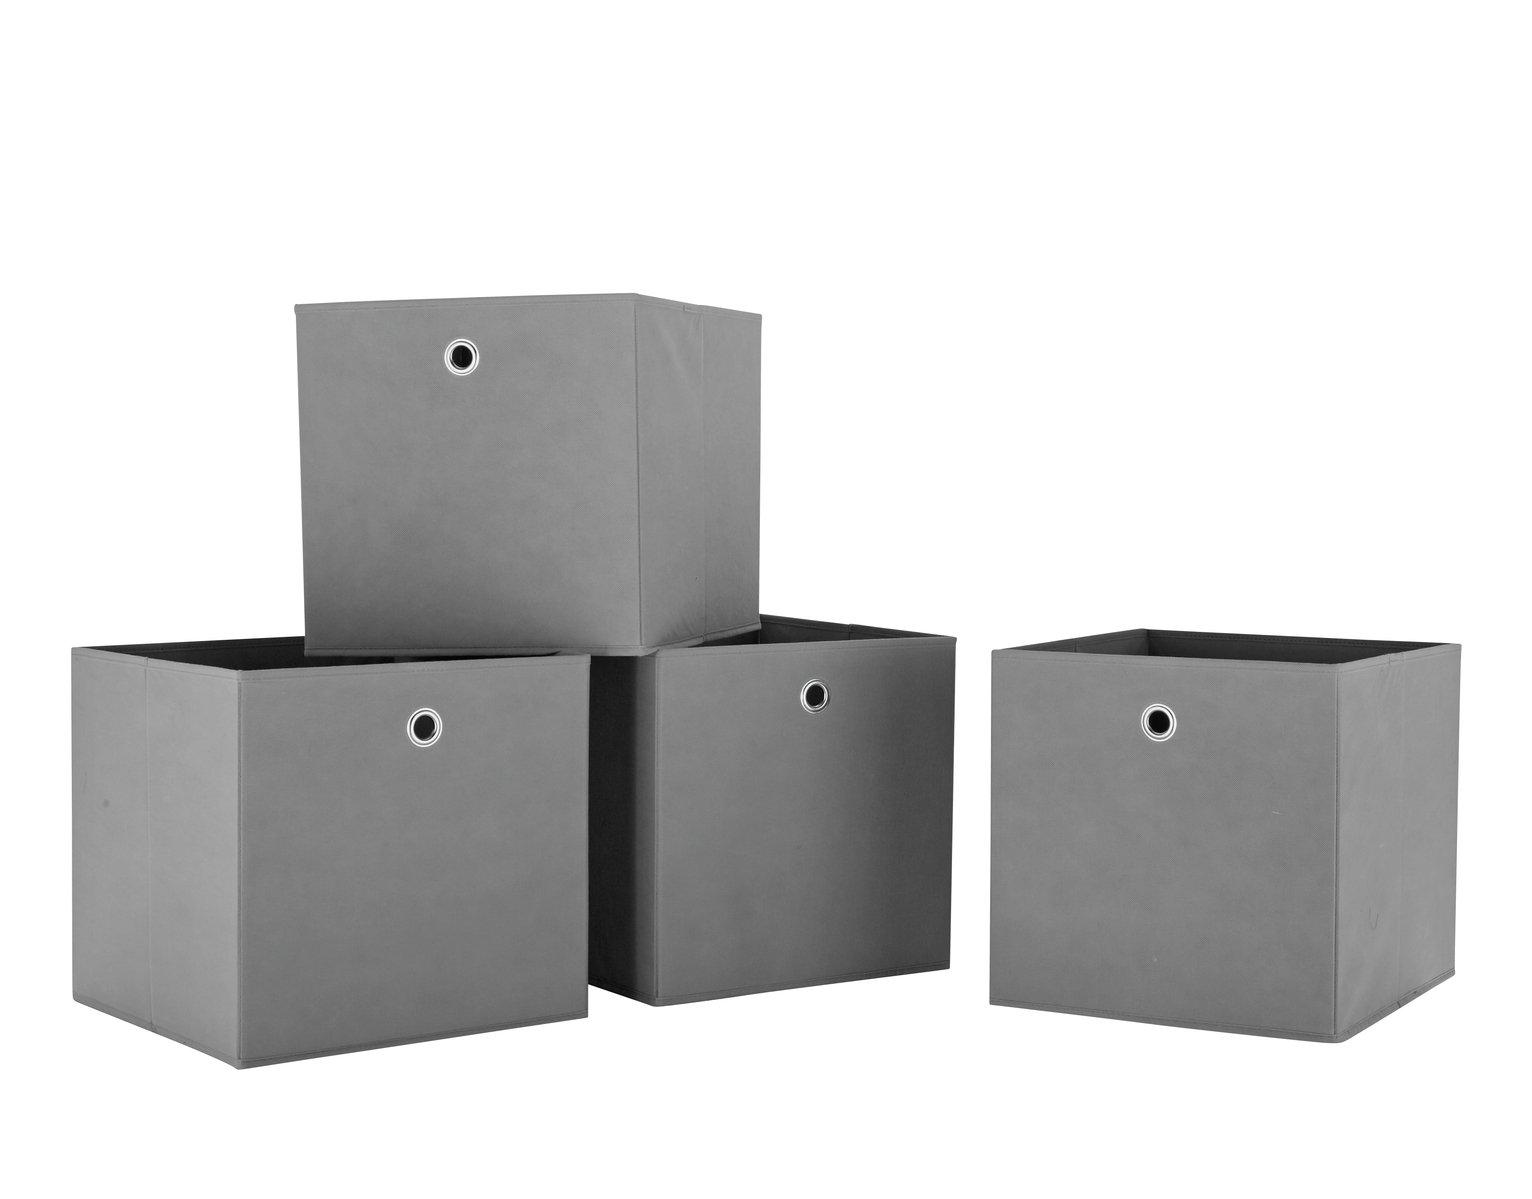 Argos Home Set of 4 Squares Plus Boxes review